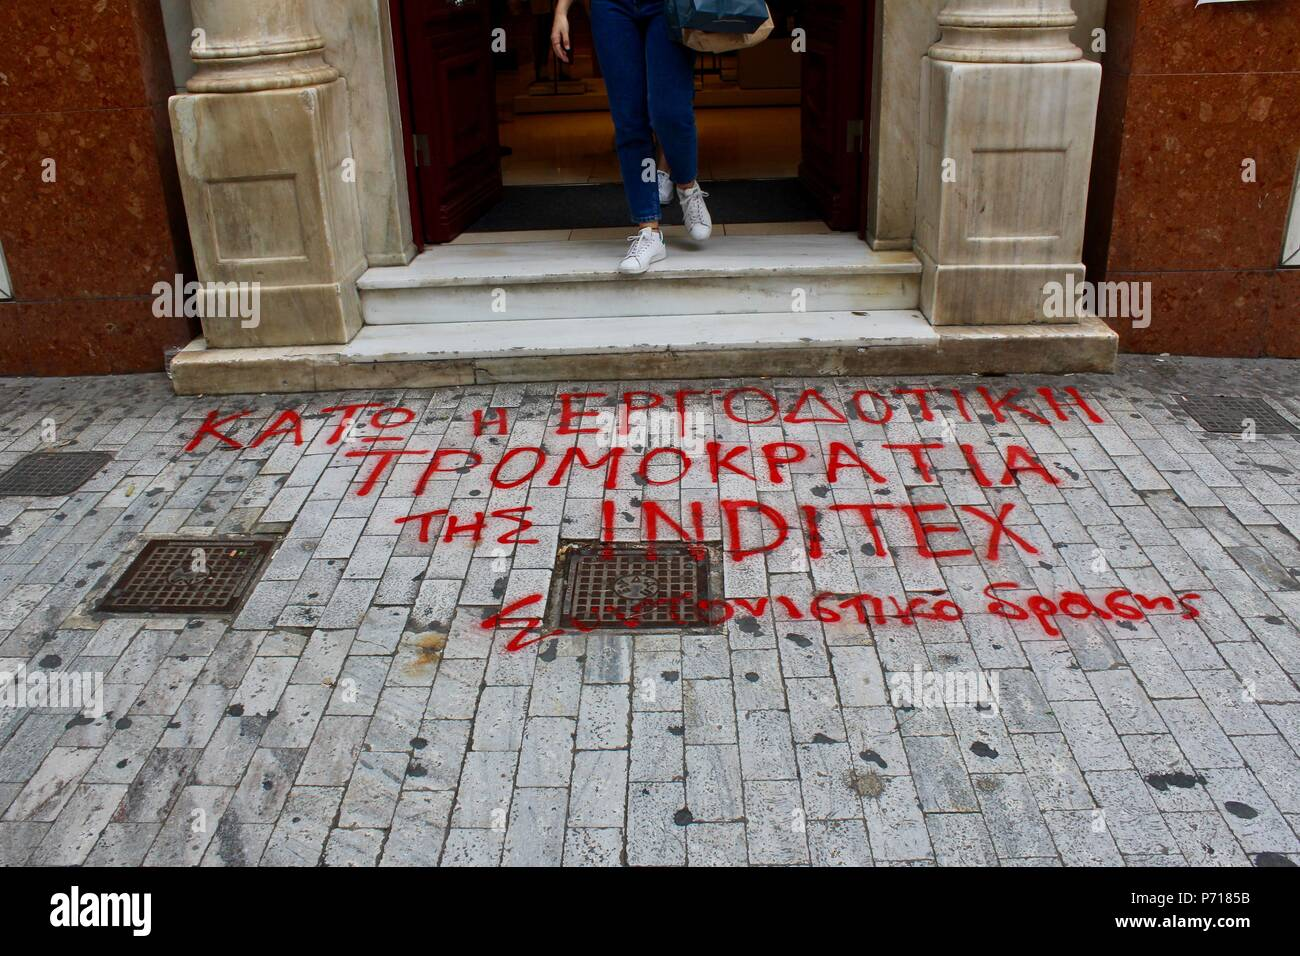 anti sunday trading graffiti outside athens store greece - Stock Image